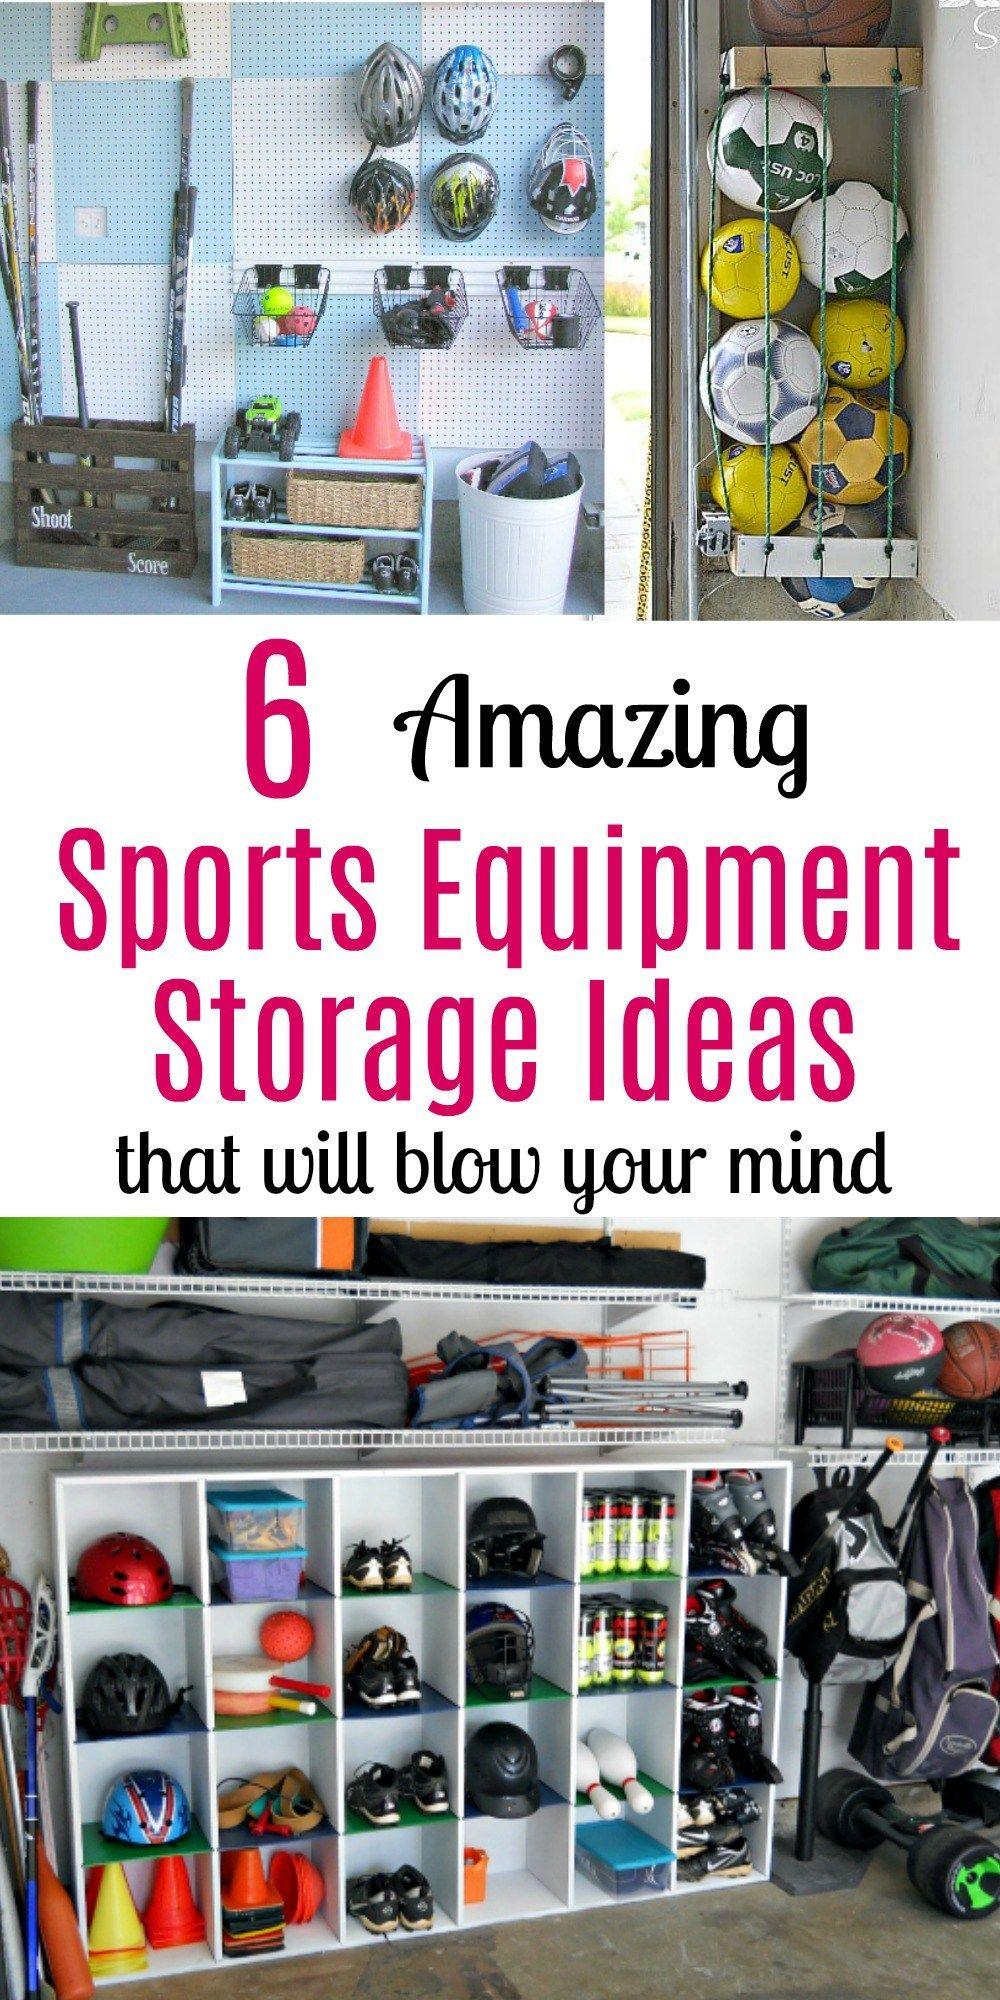 6 Amazing Sports Equipment Storage Ideas That Will Blow Your Mind Sports Equipment Storage Gym Equipment Storage Sports Equipment Organization